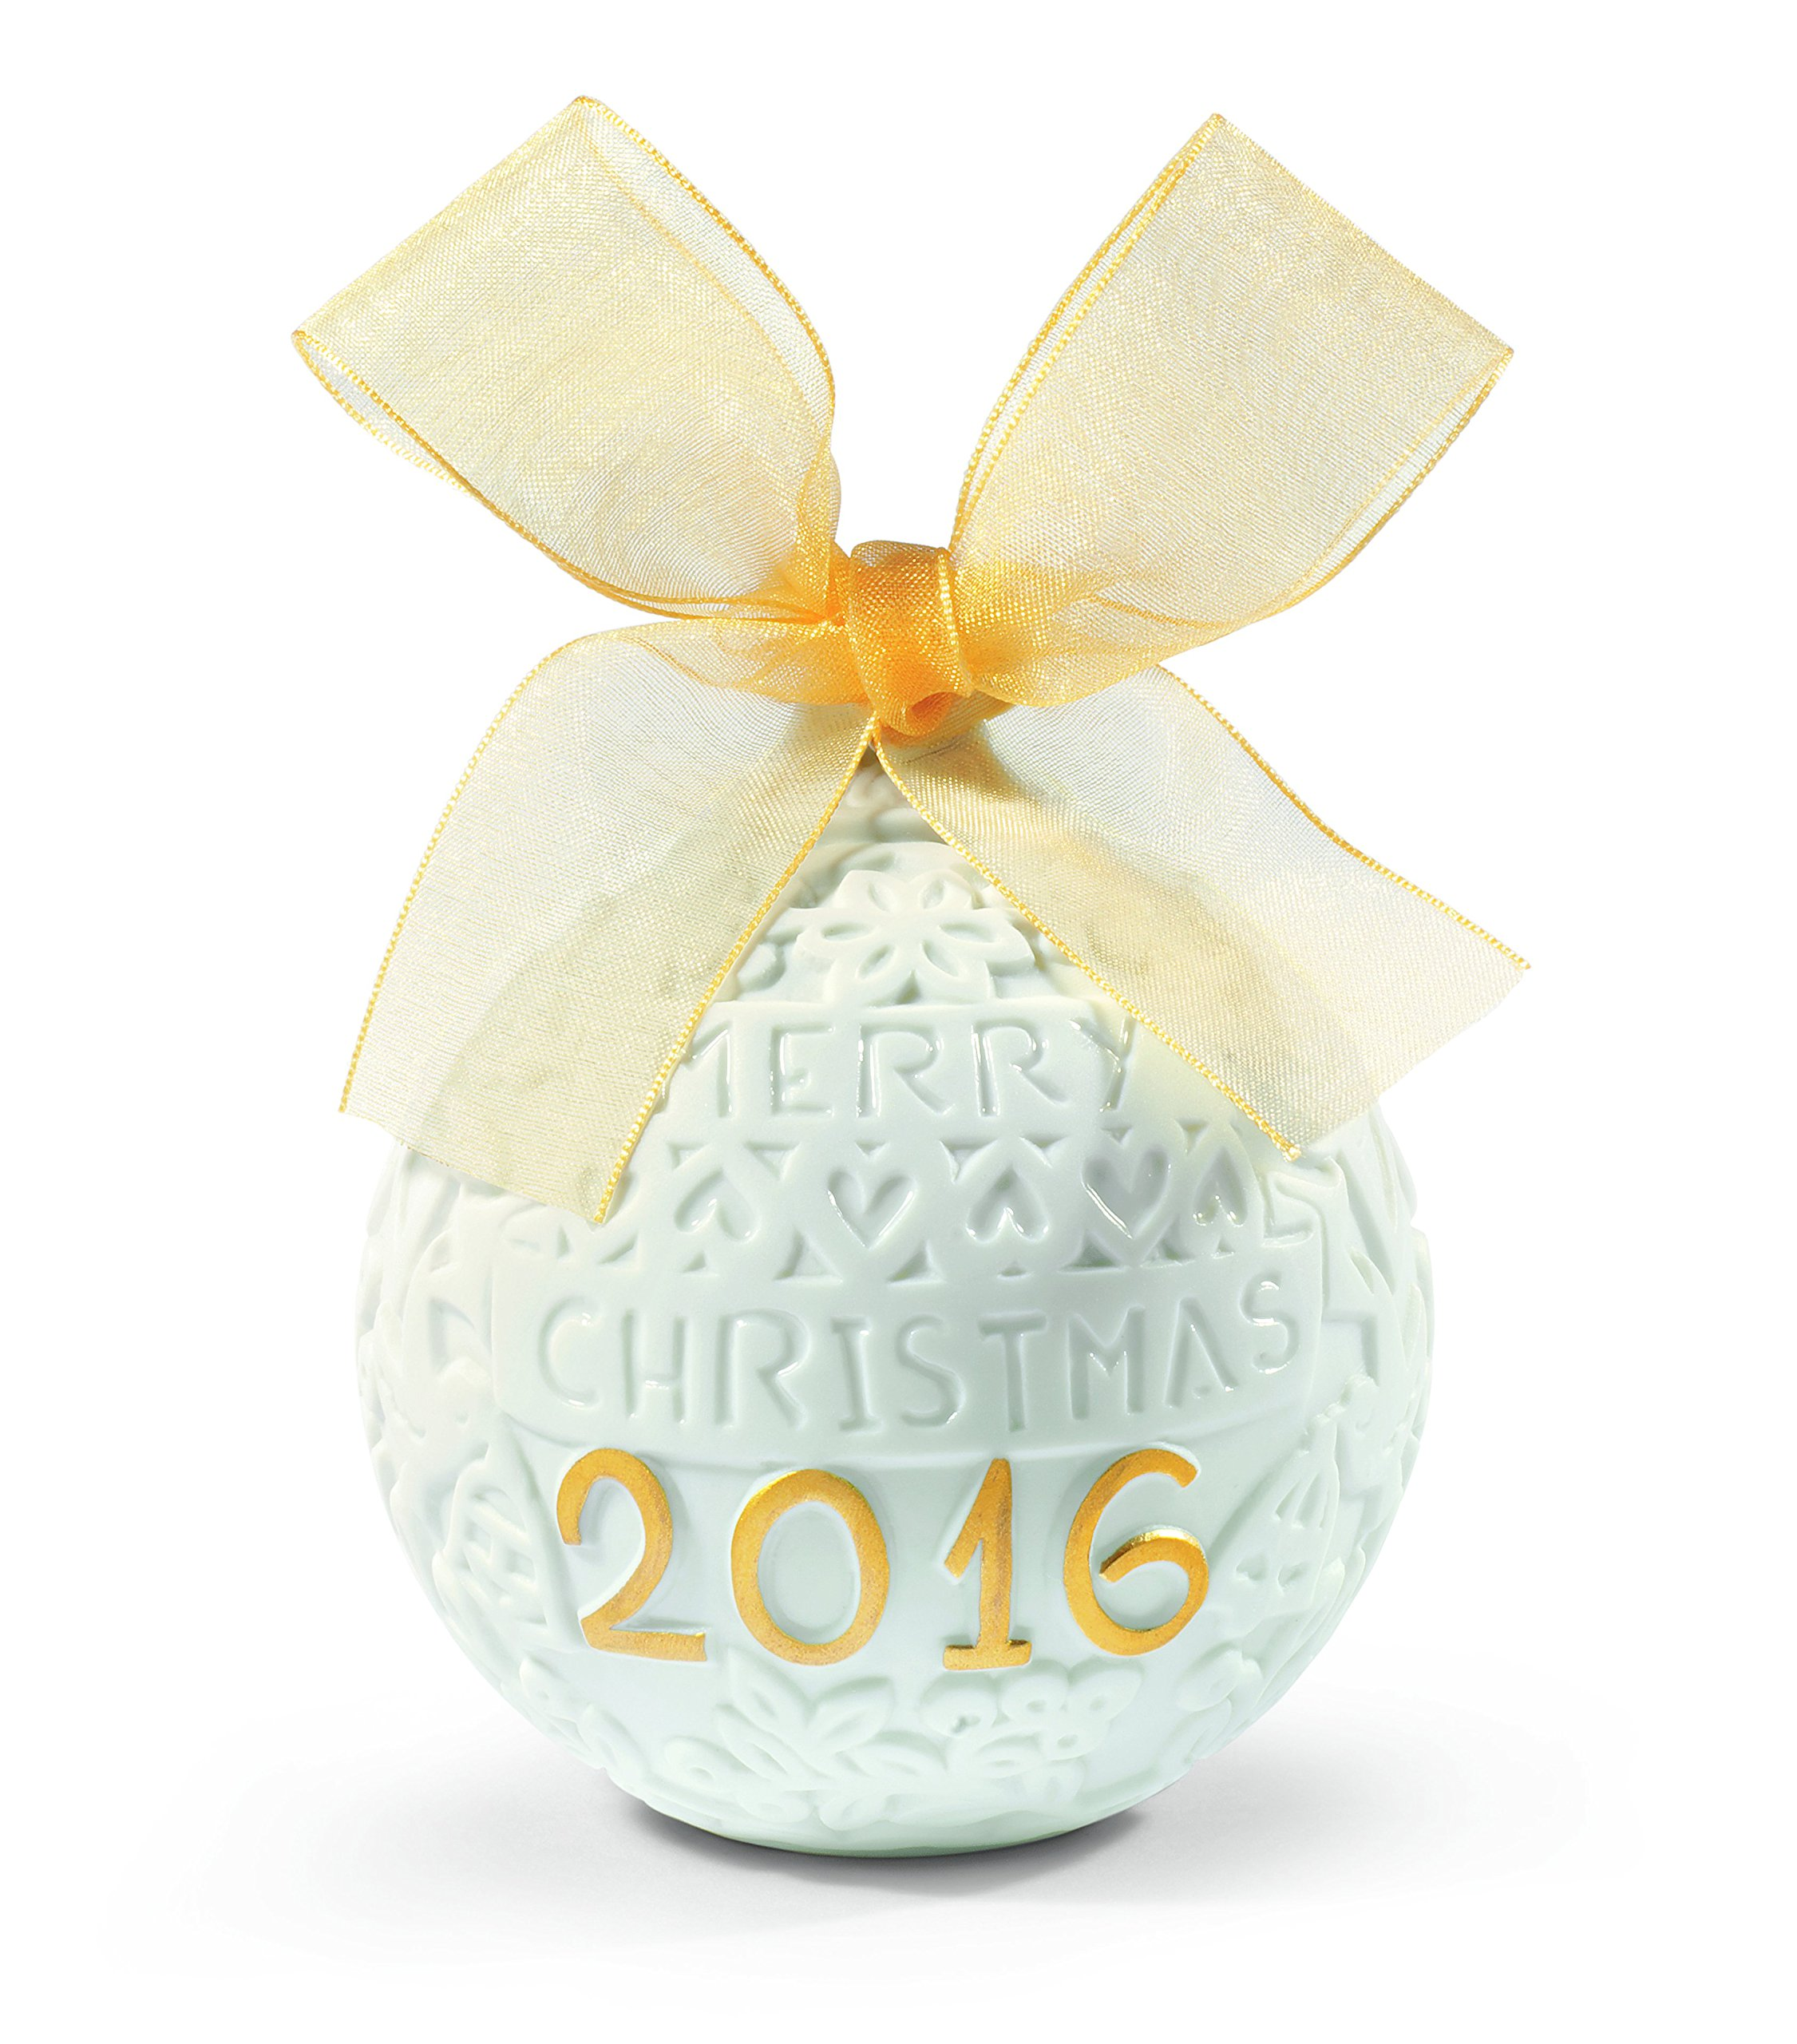 Lladro 2016 Annual Christmas Re-deco Ball Ornament #18412